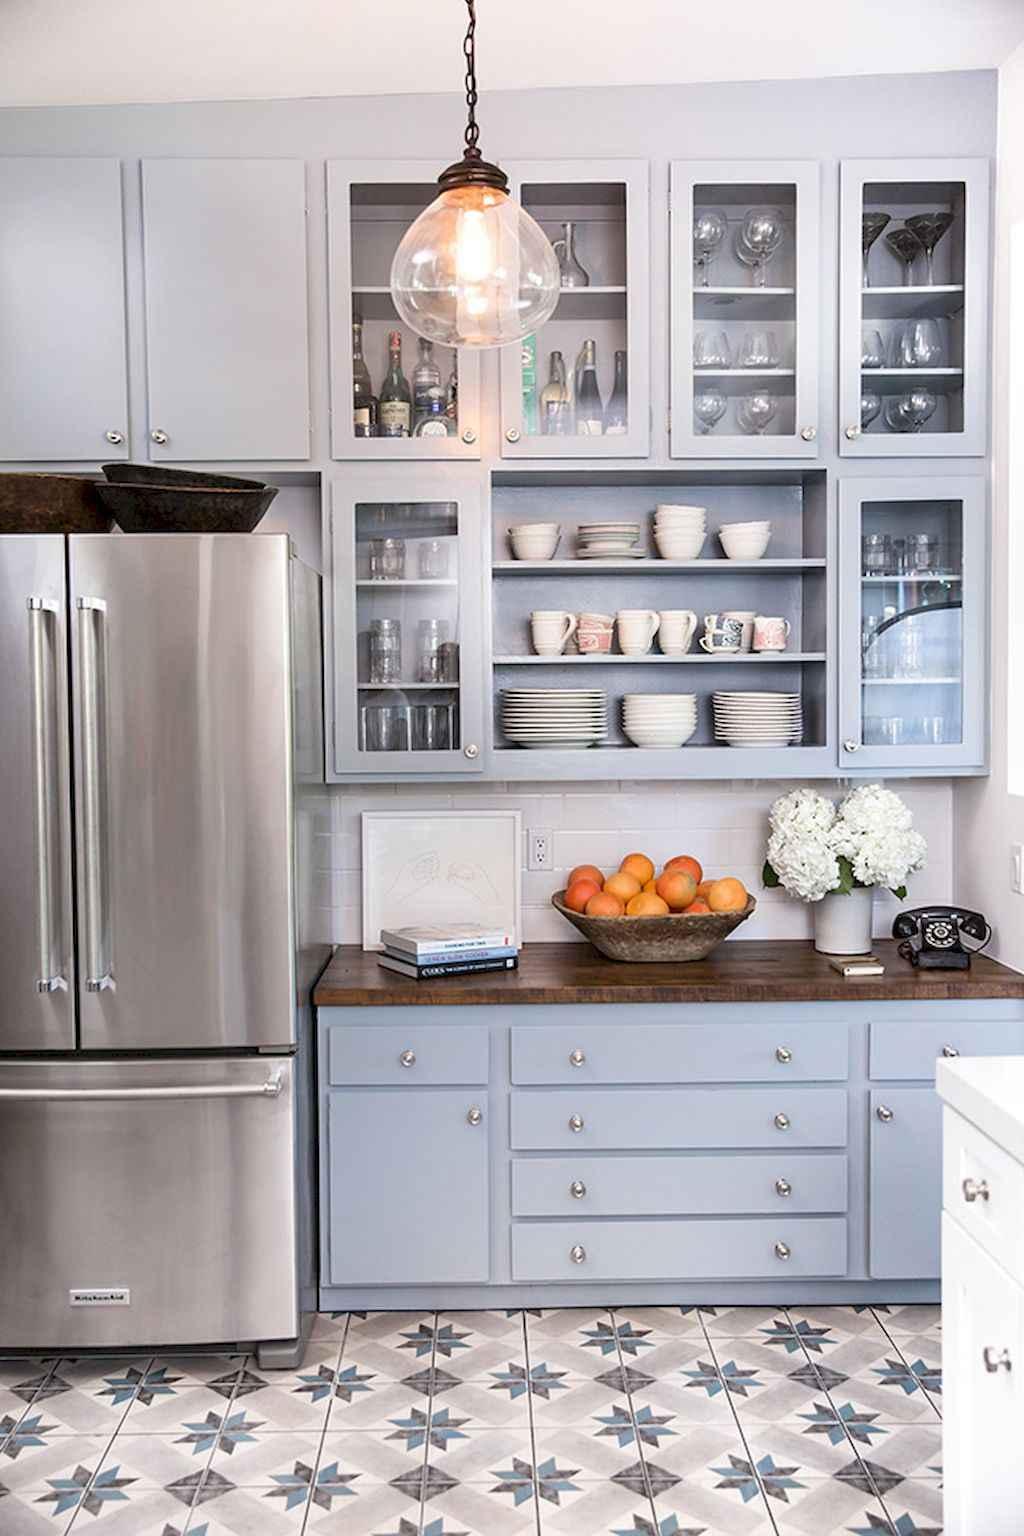 Mid century modern kitchen design ideas (19)